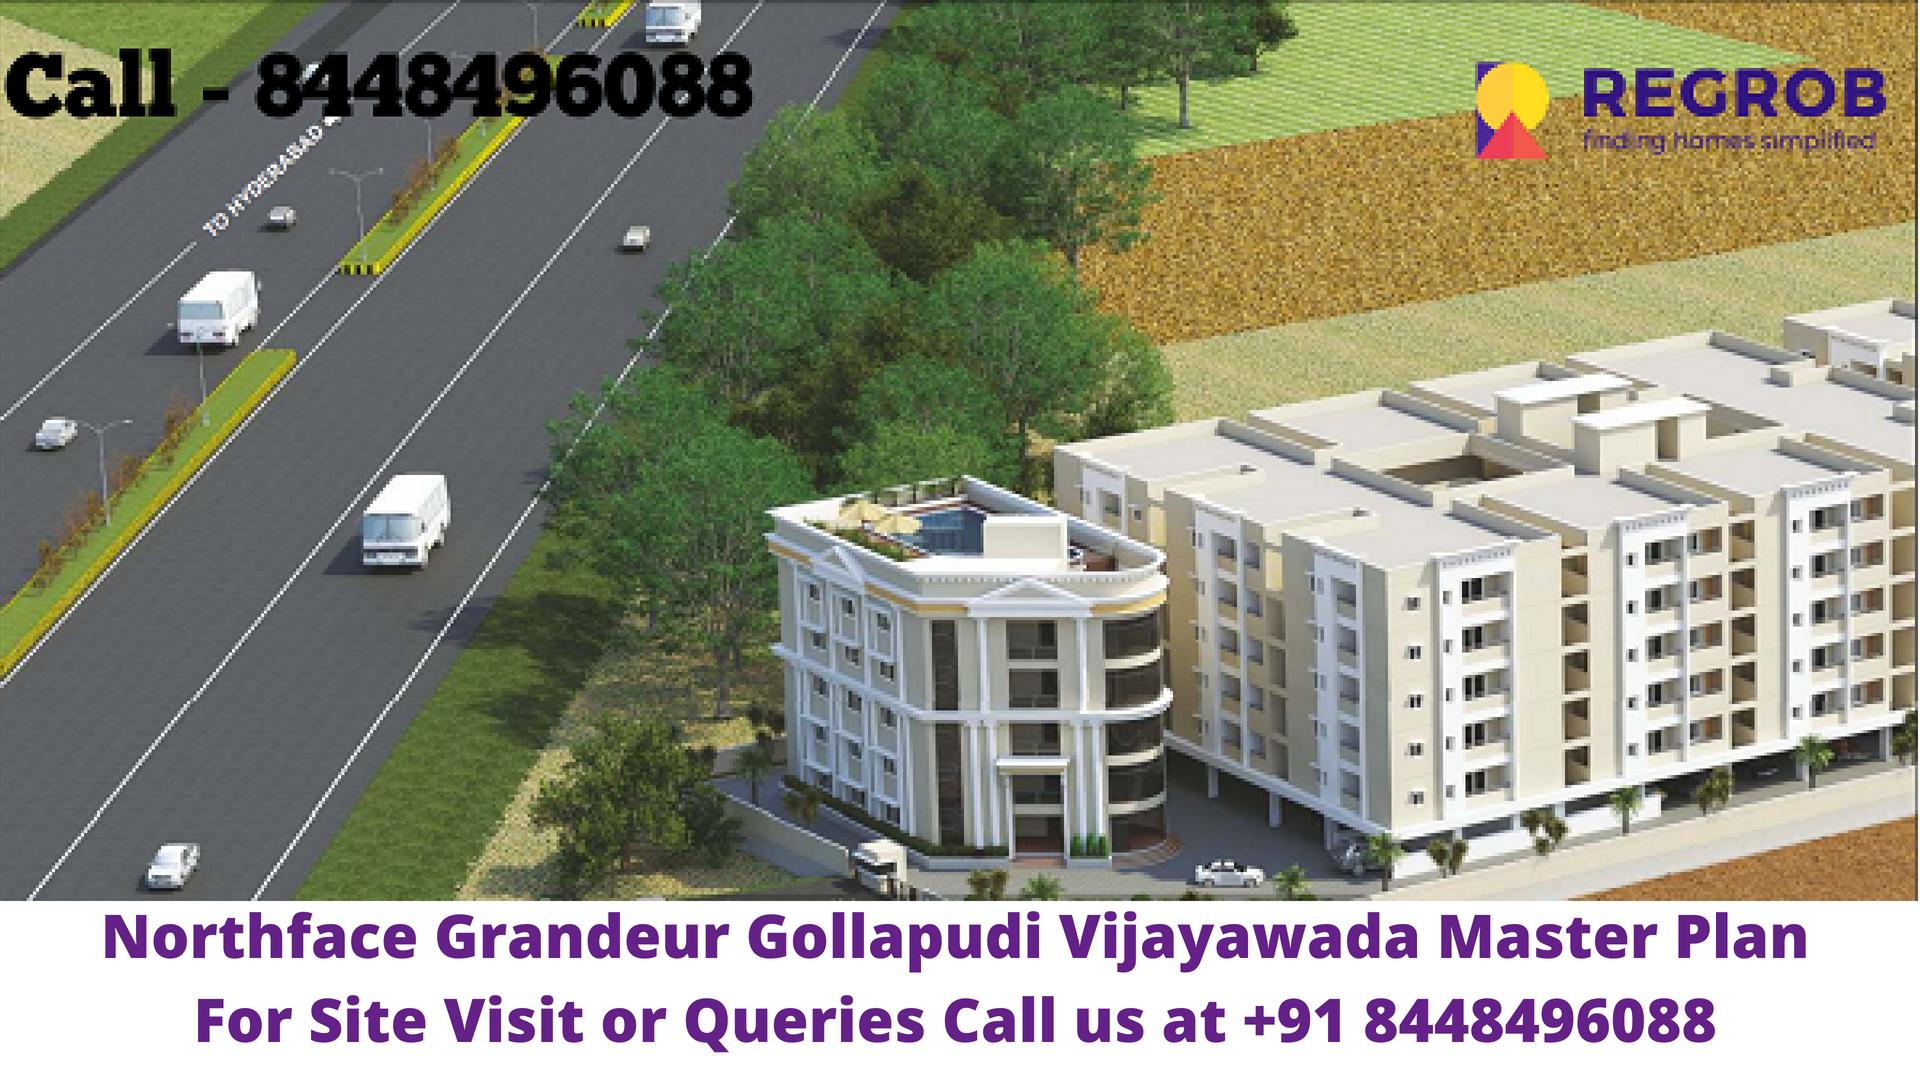 Northface Grandeur Gollapudi Vijayawada